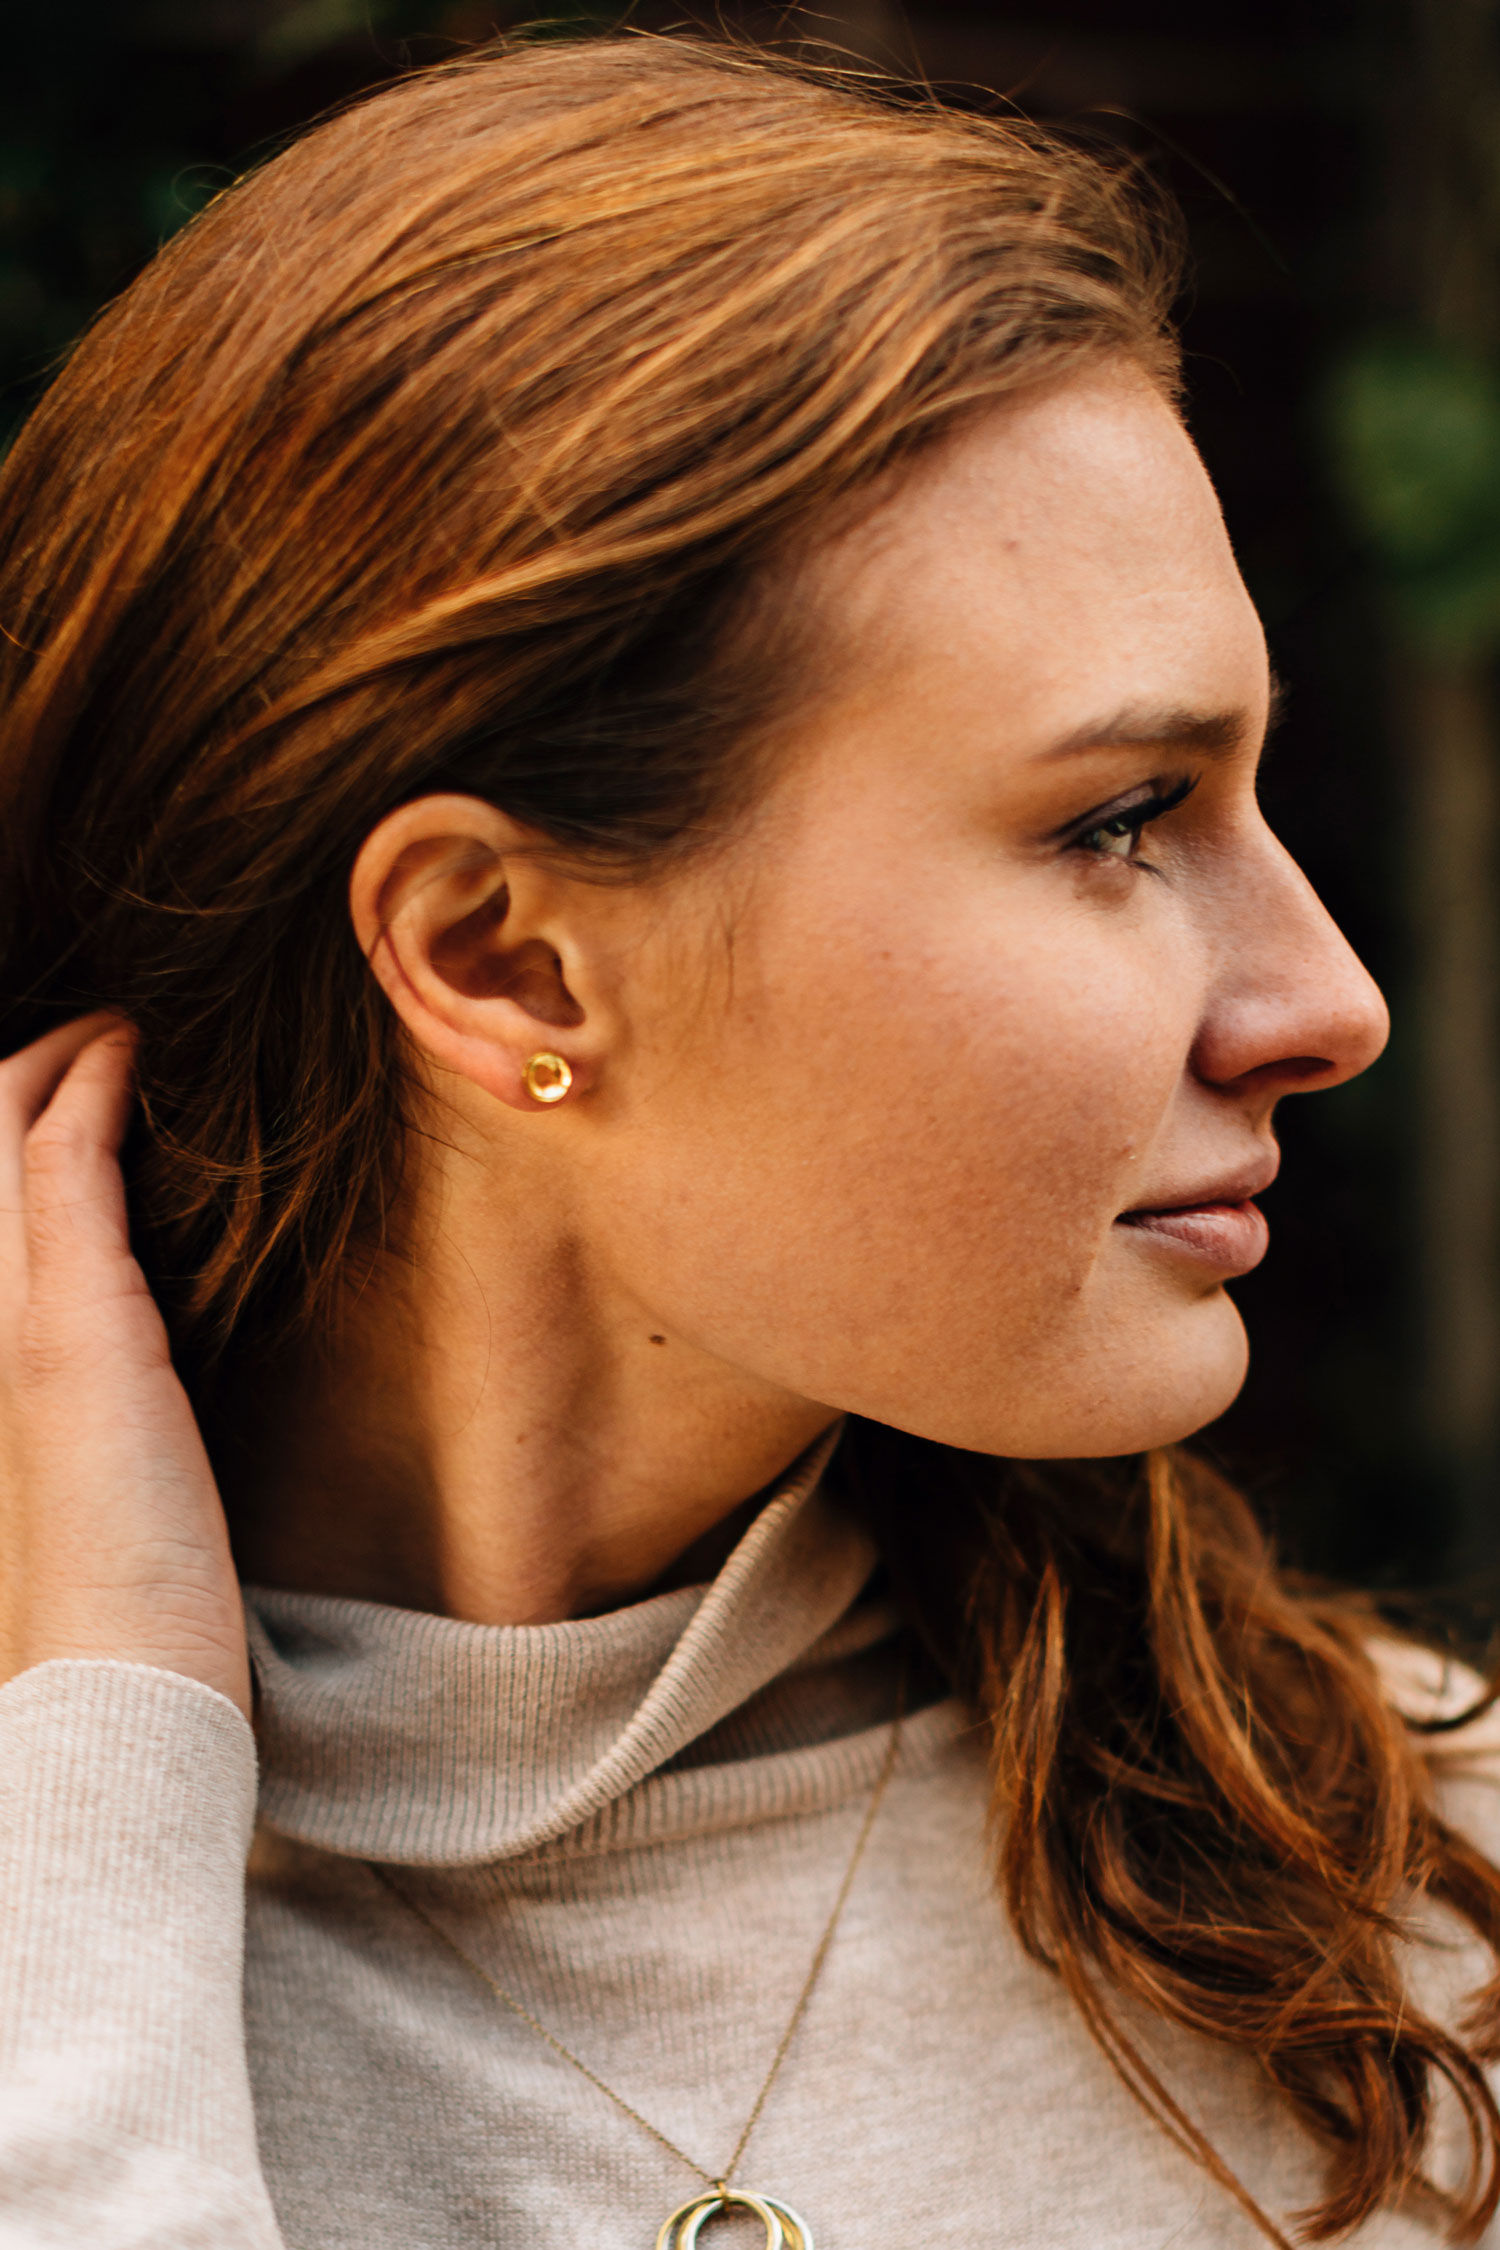 Ethical Earrings | Impression Earrings